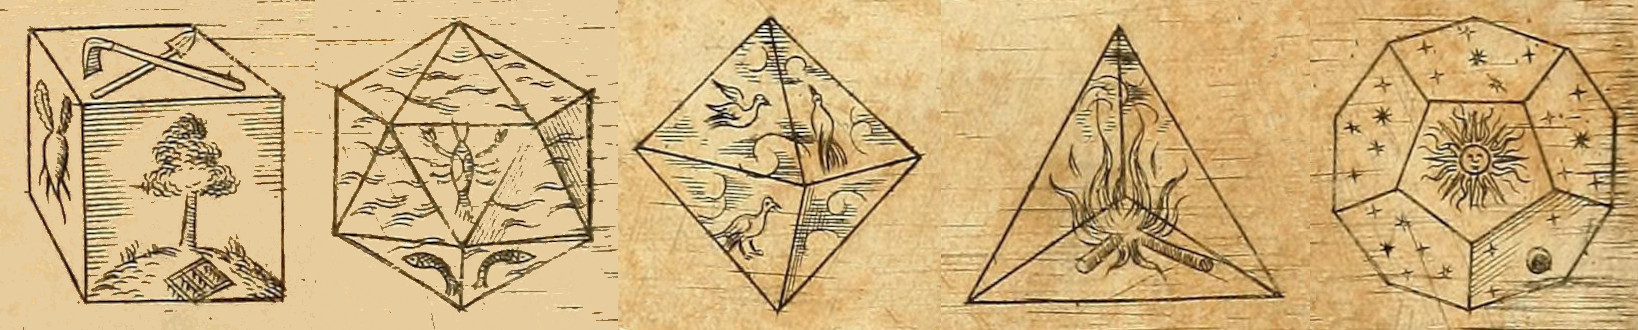 The five Platonic solids.